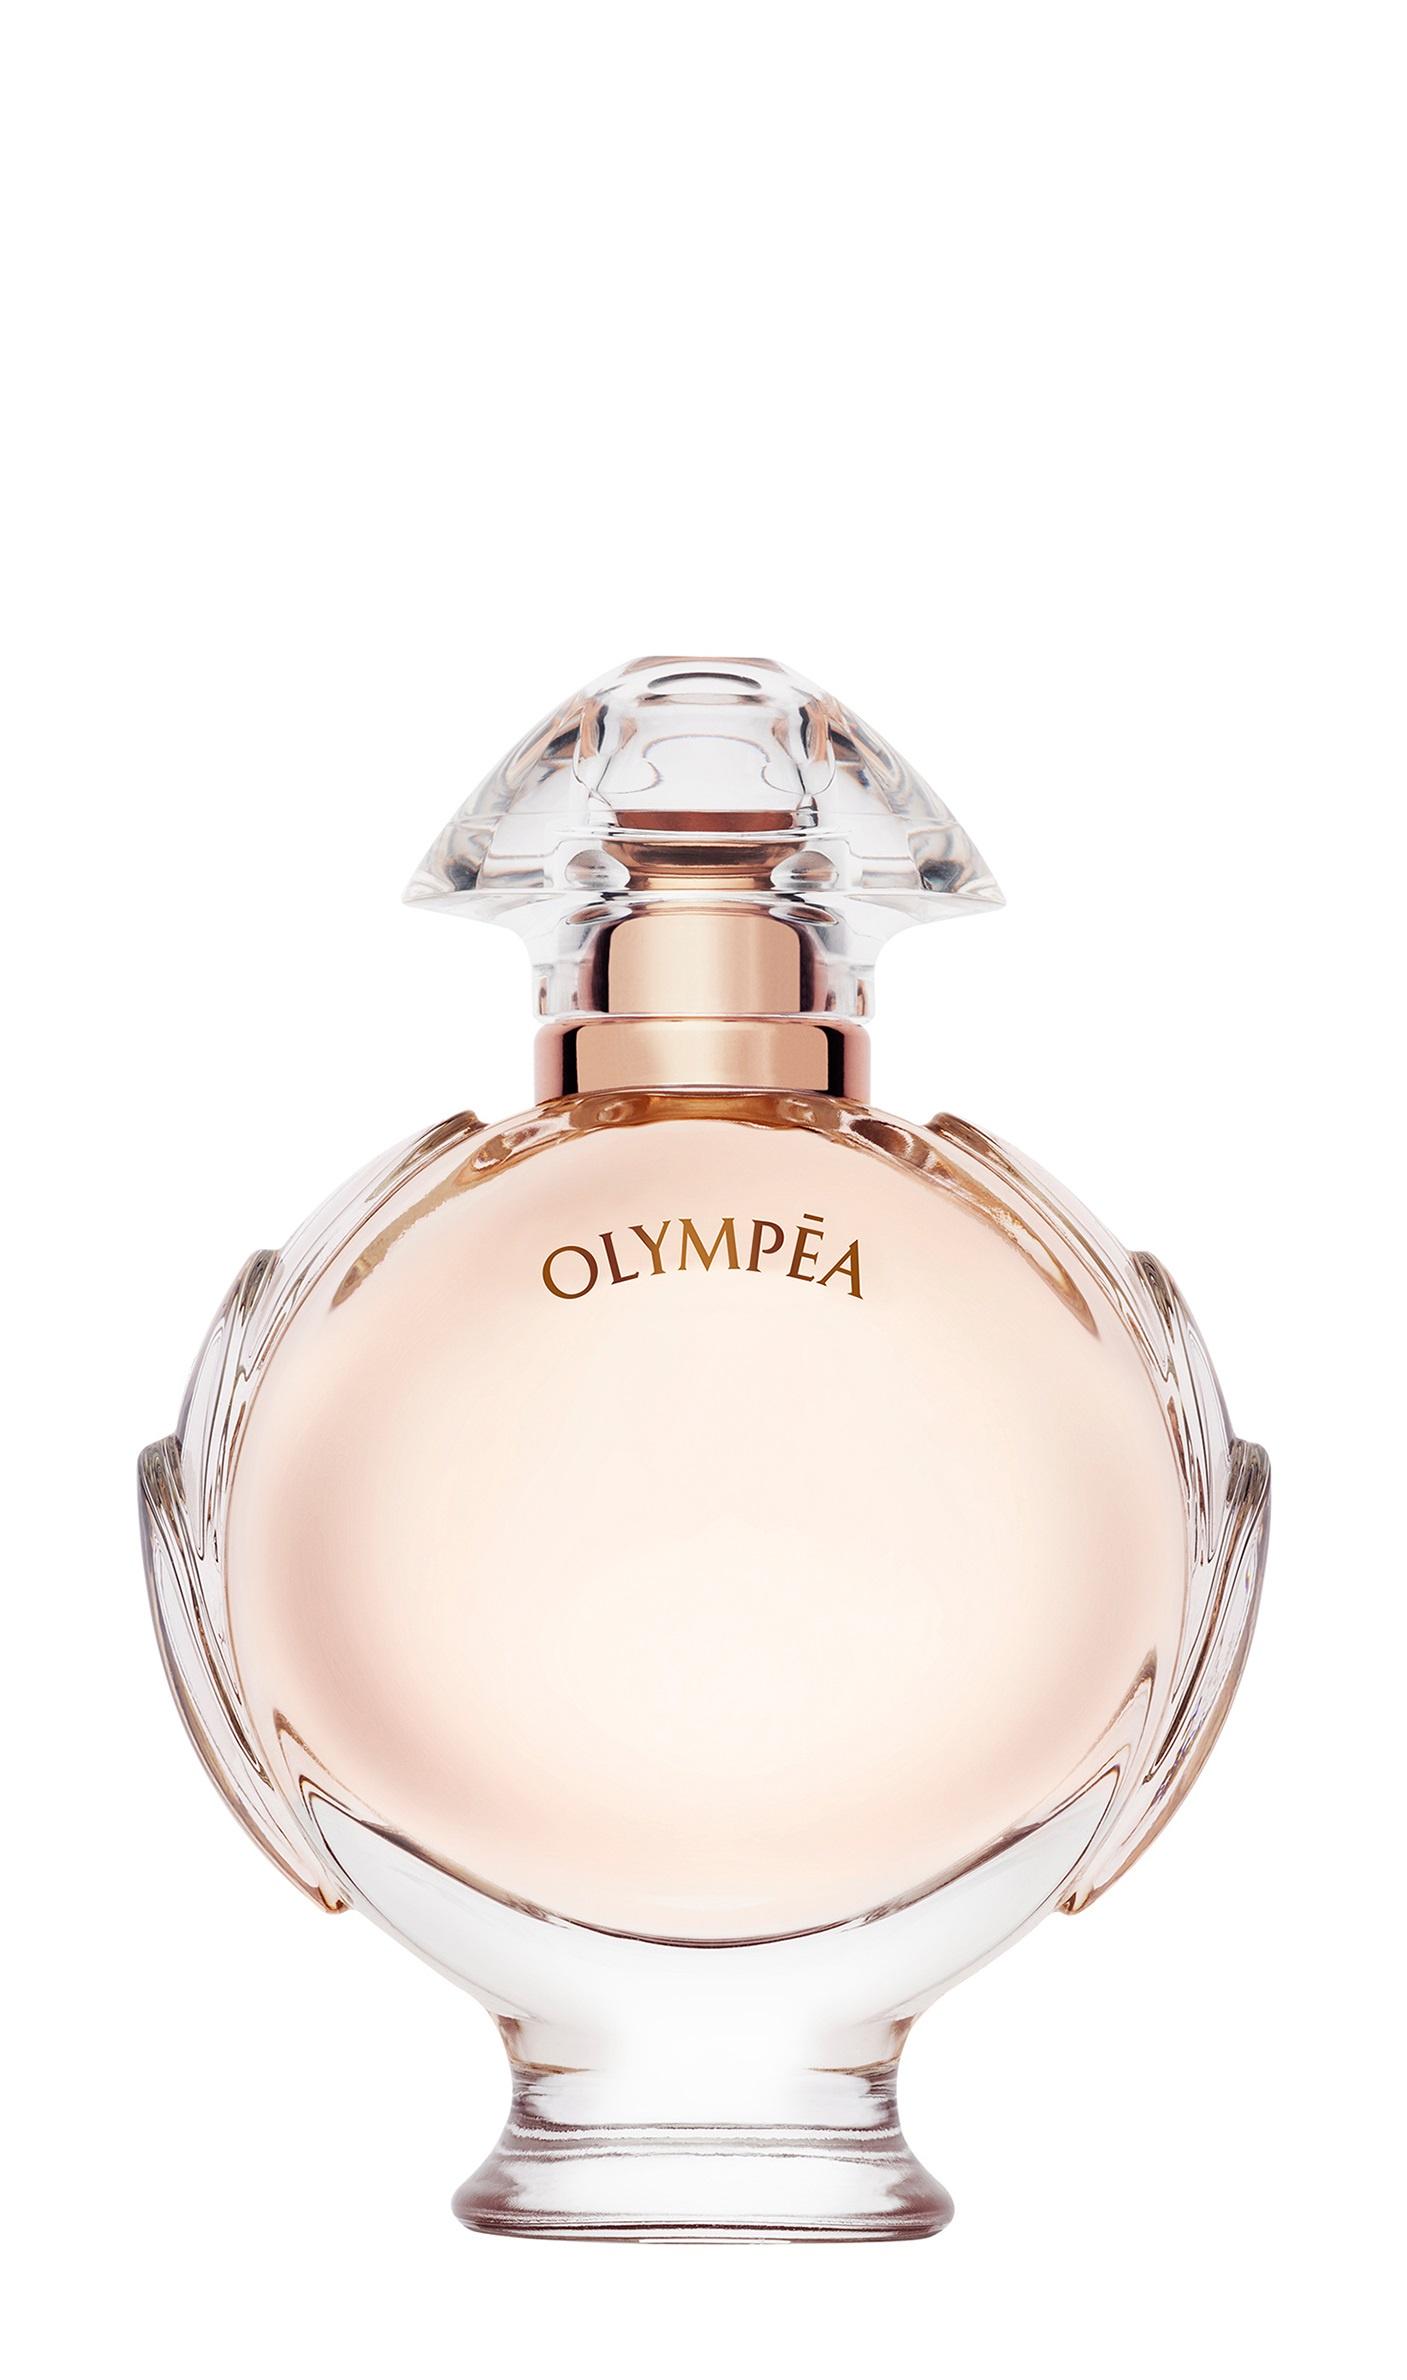 Paco Rabanne Olympea Eau de Parfum 30мл Paco Rabanne